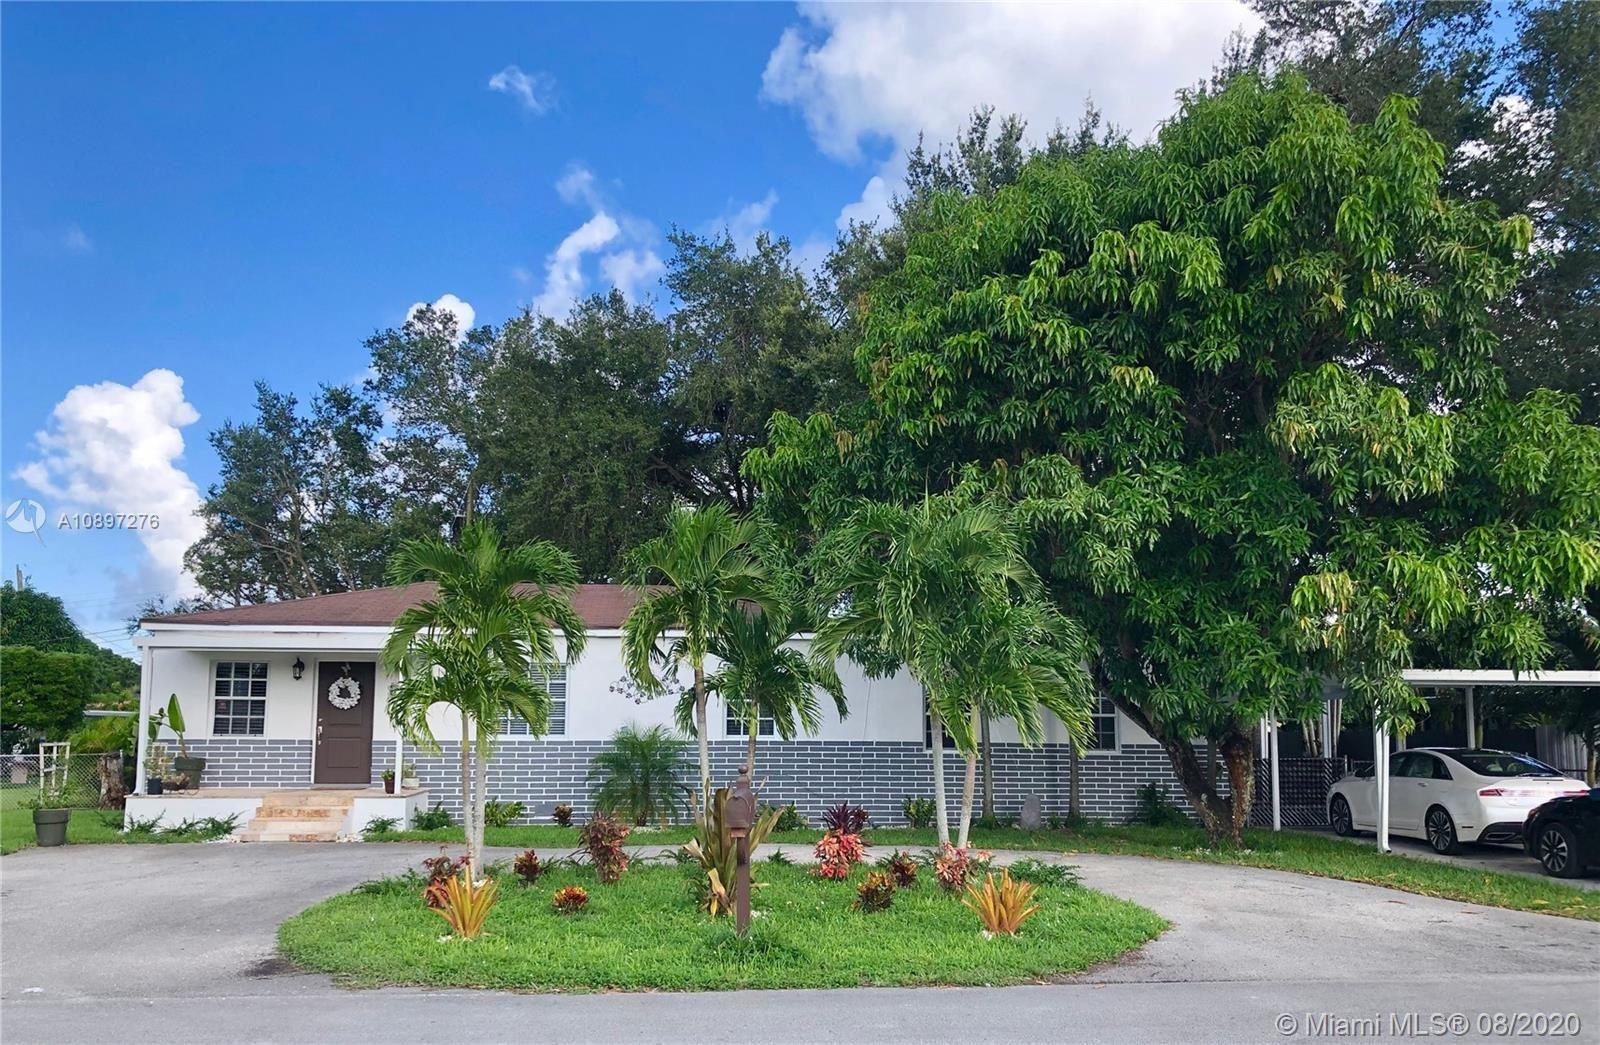 7340 SW 18th St Rd, Miami, FL 33155 - #: A10897276